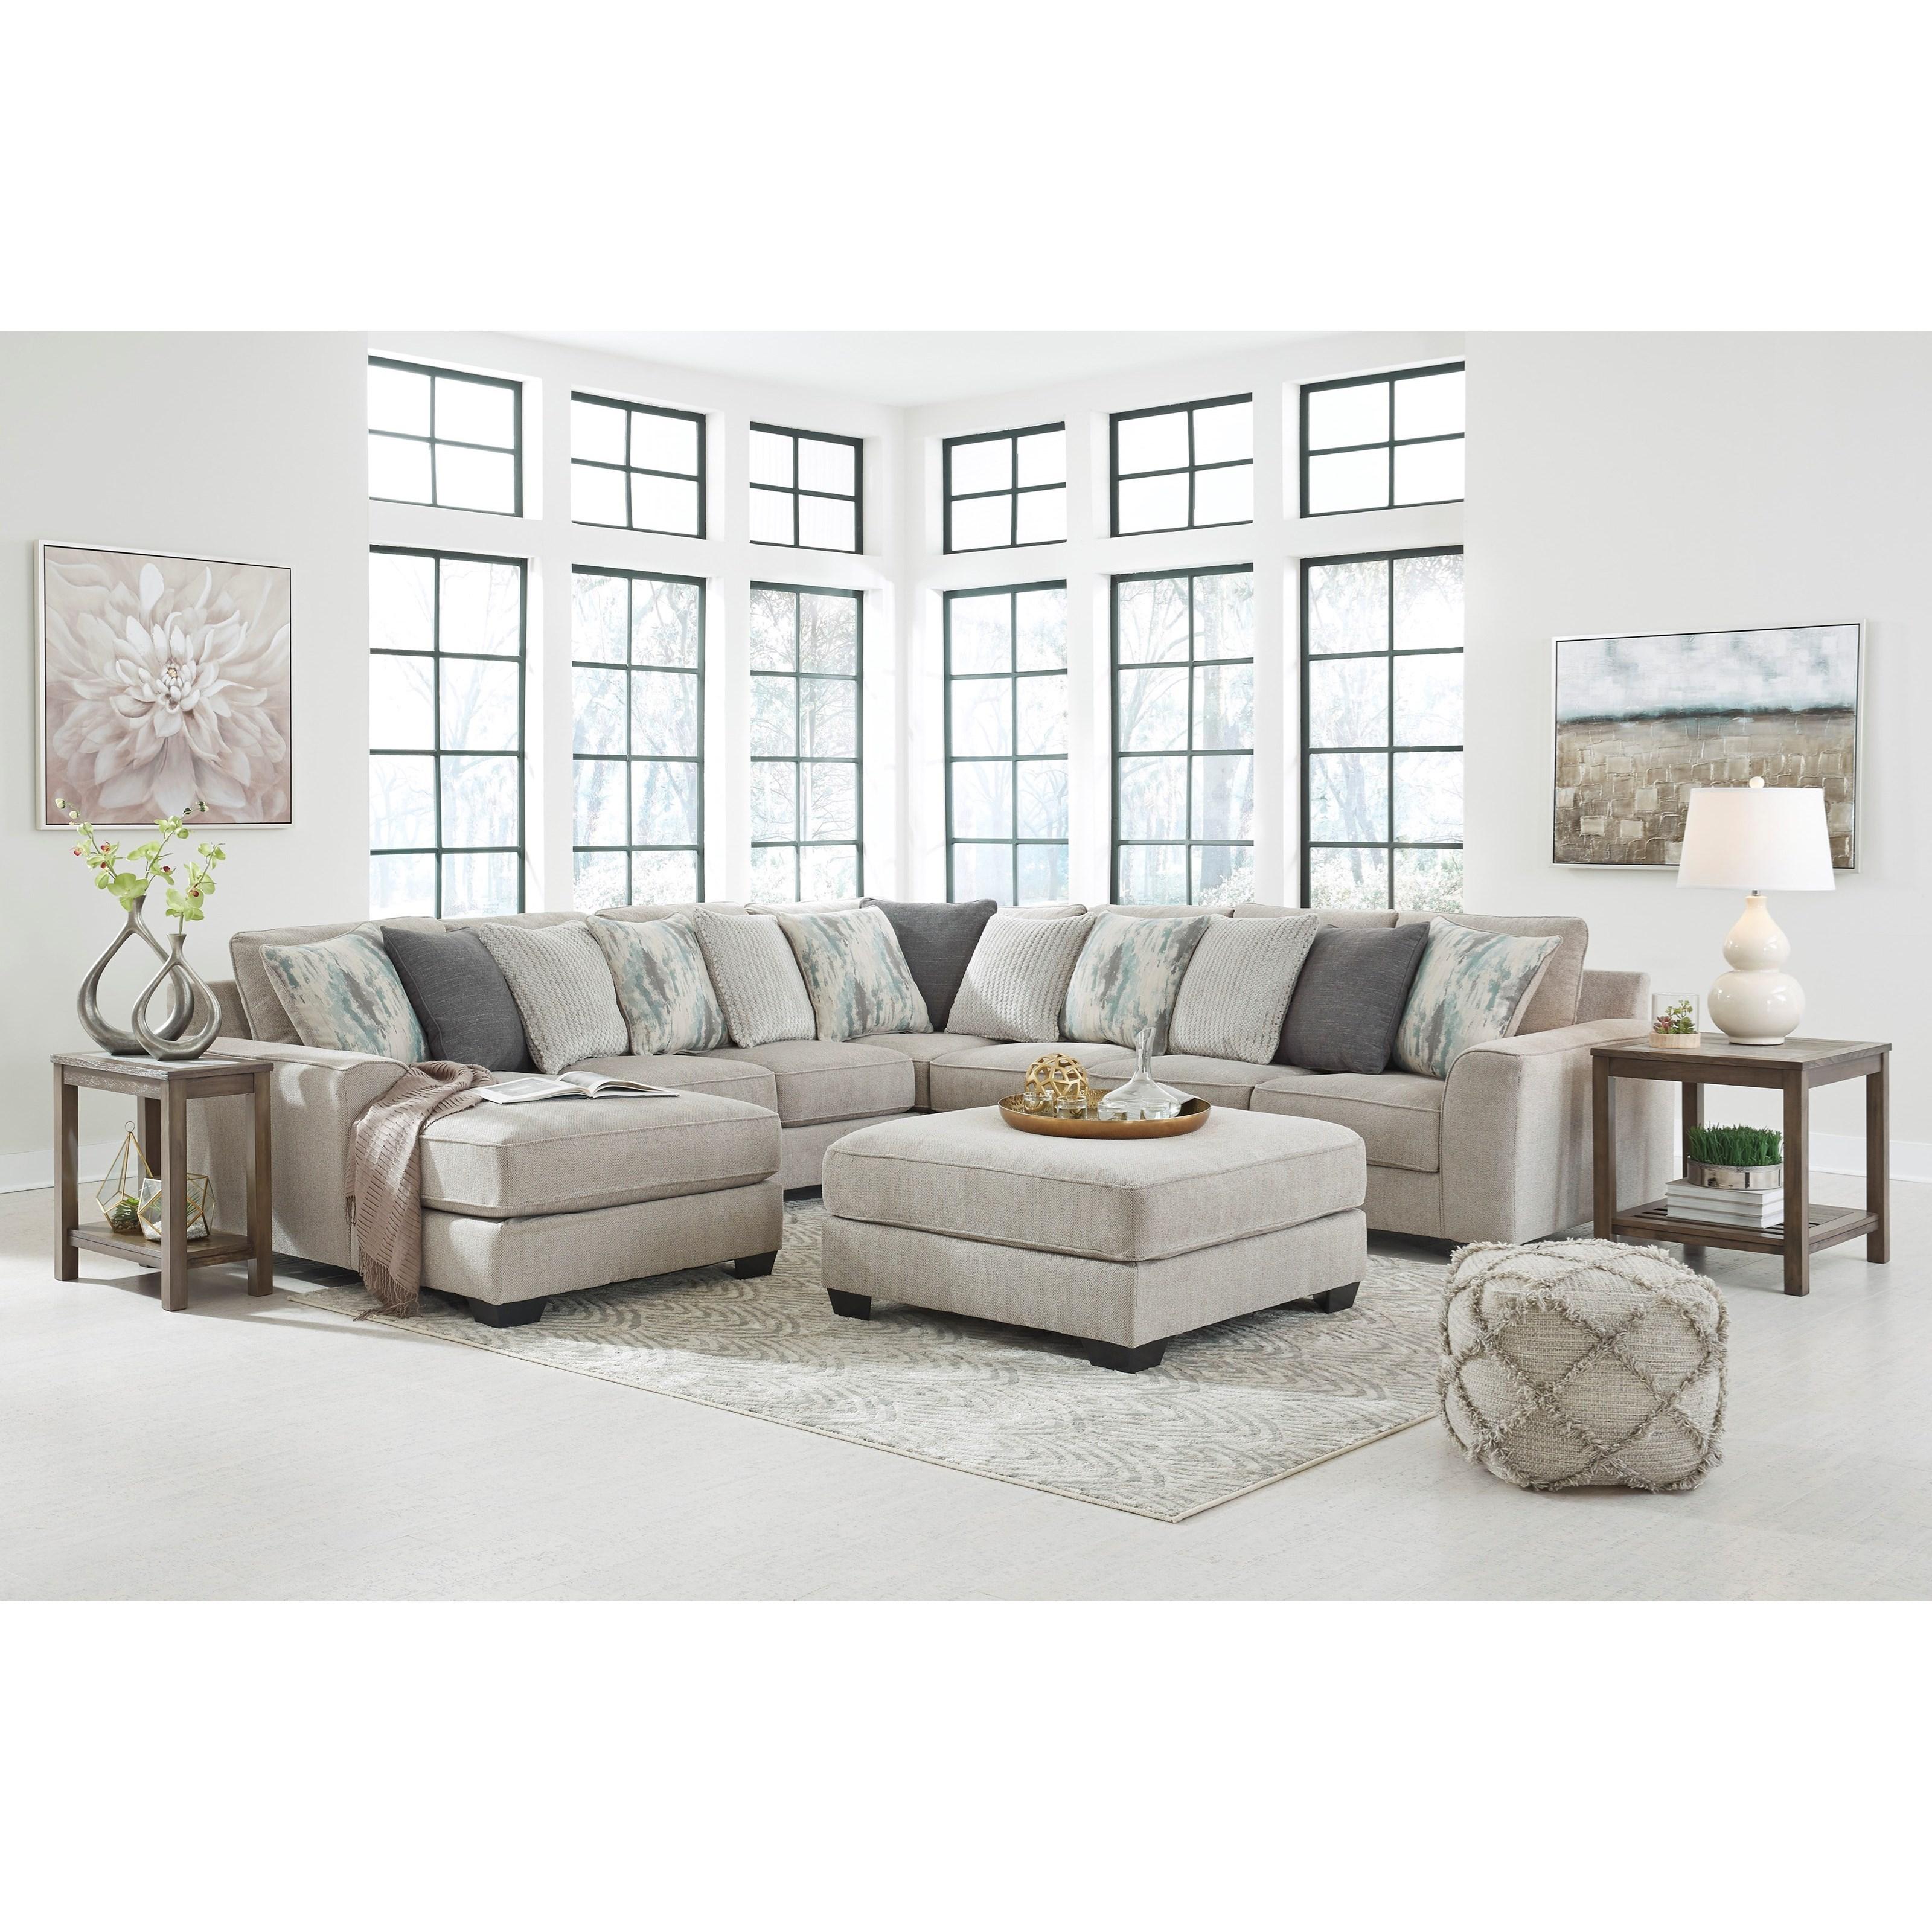 Ardsley Stationary Living Room Group by Benchcraft at Furniture Fair - North Carolina